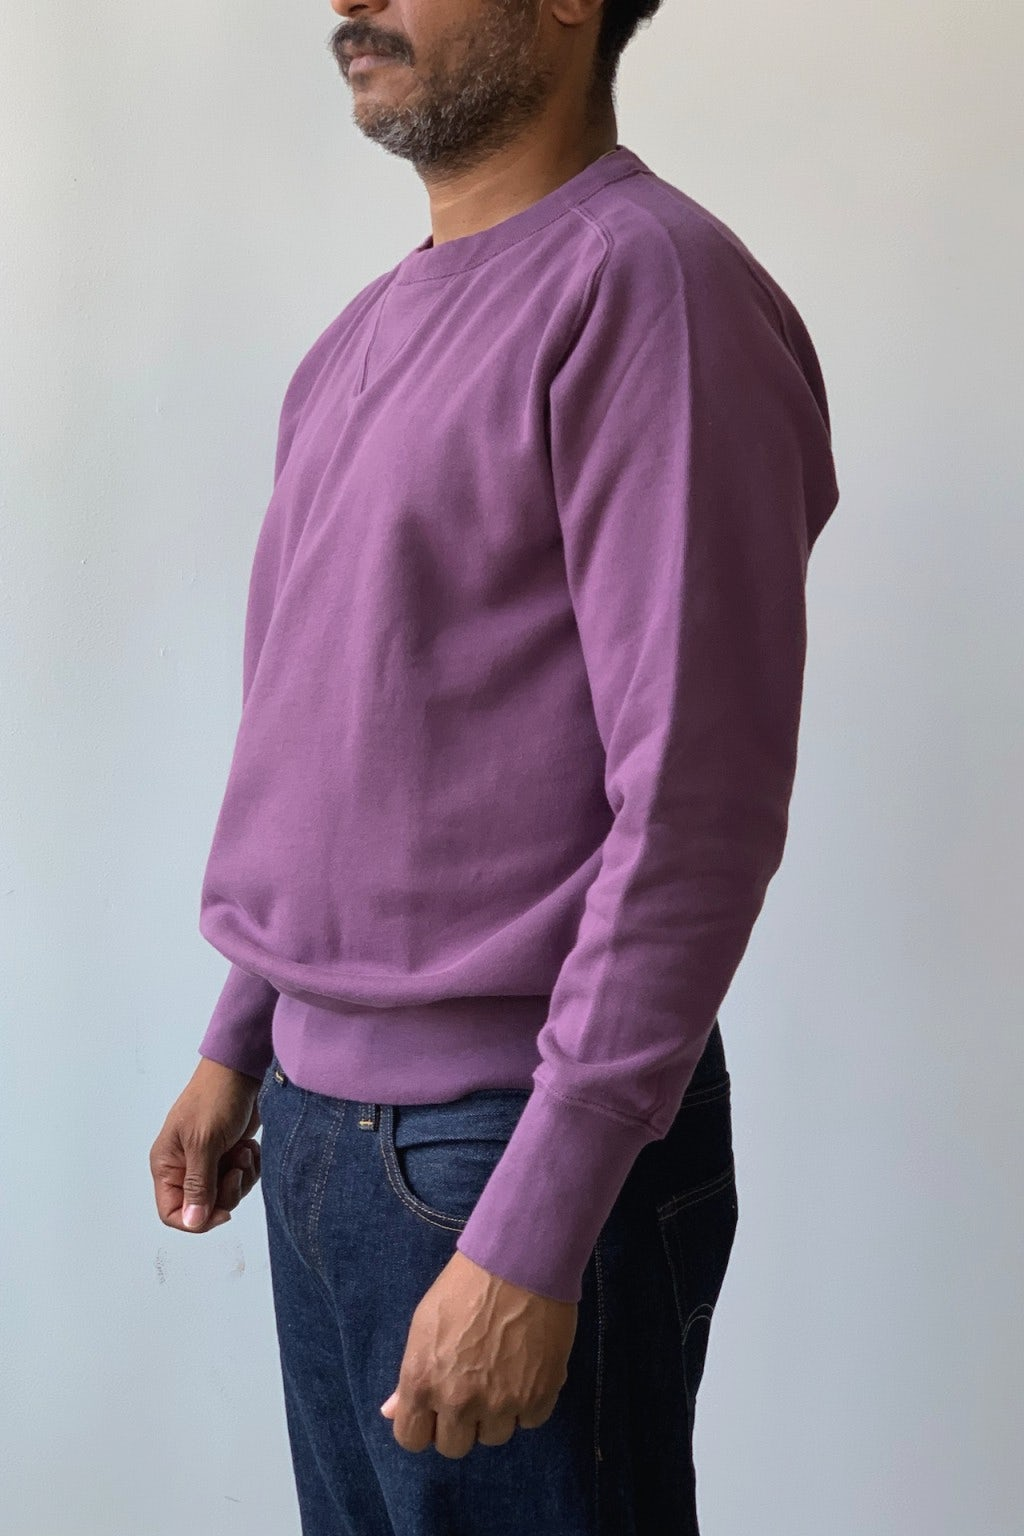 Levi's Bay Meadows Sweatshirt Purple